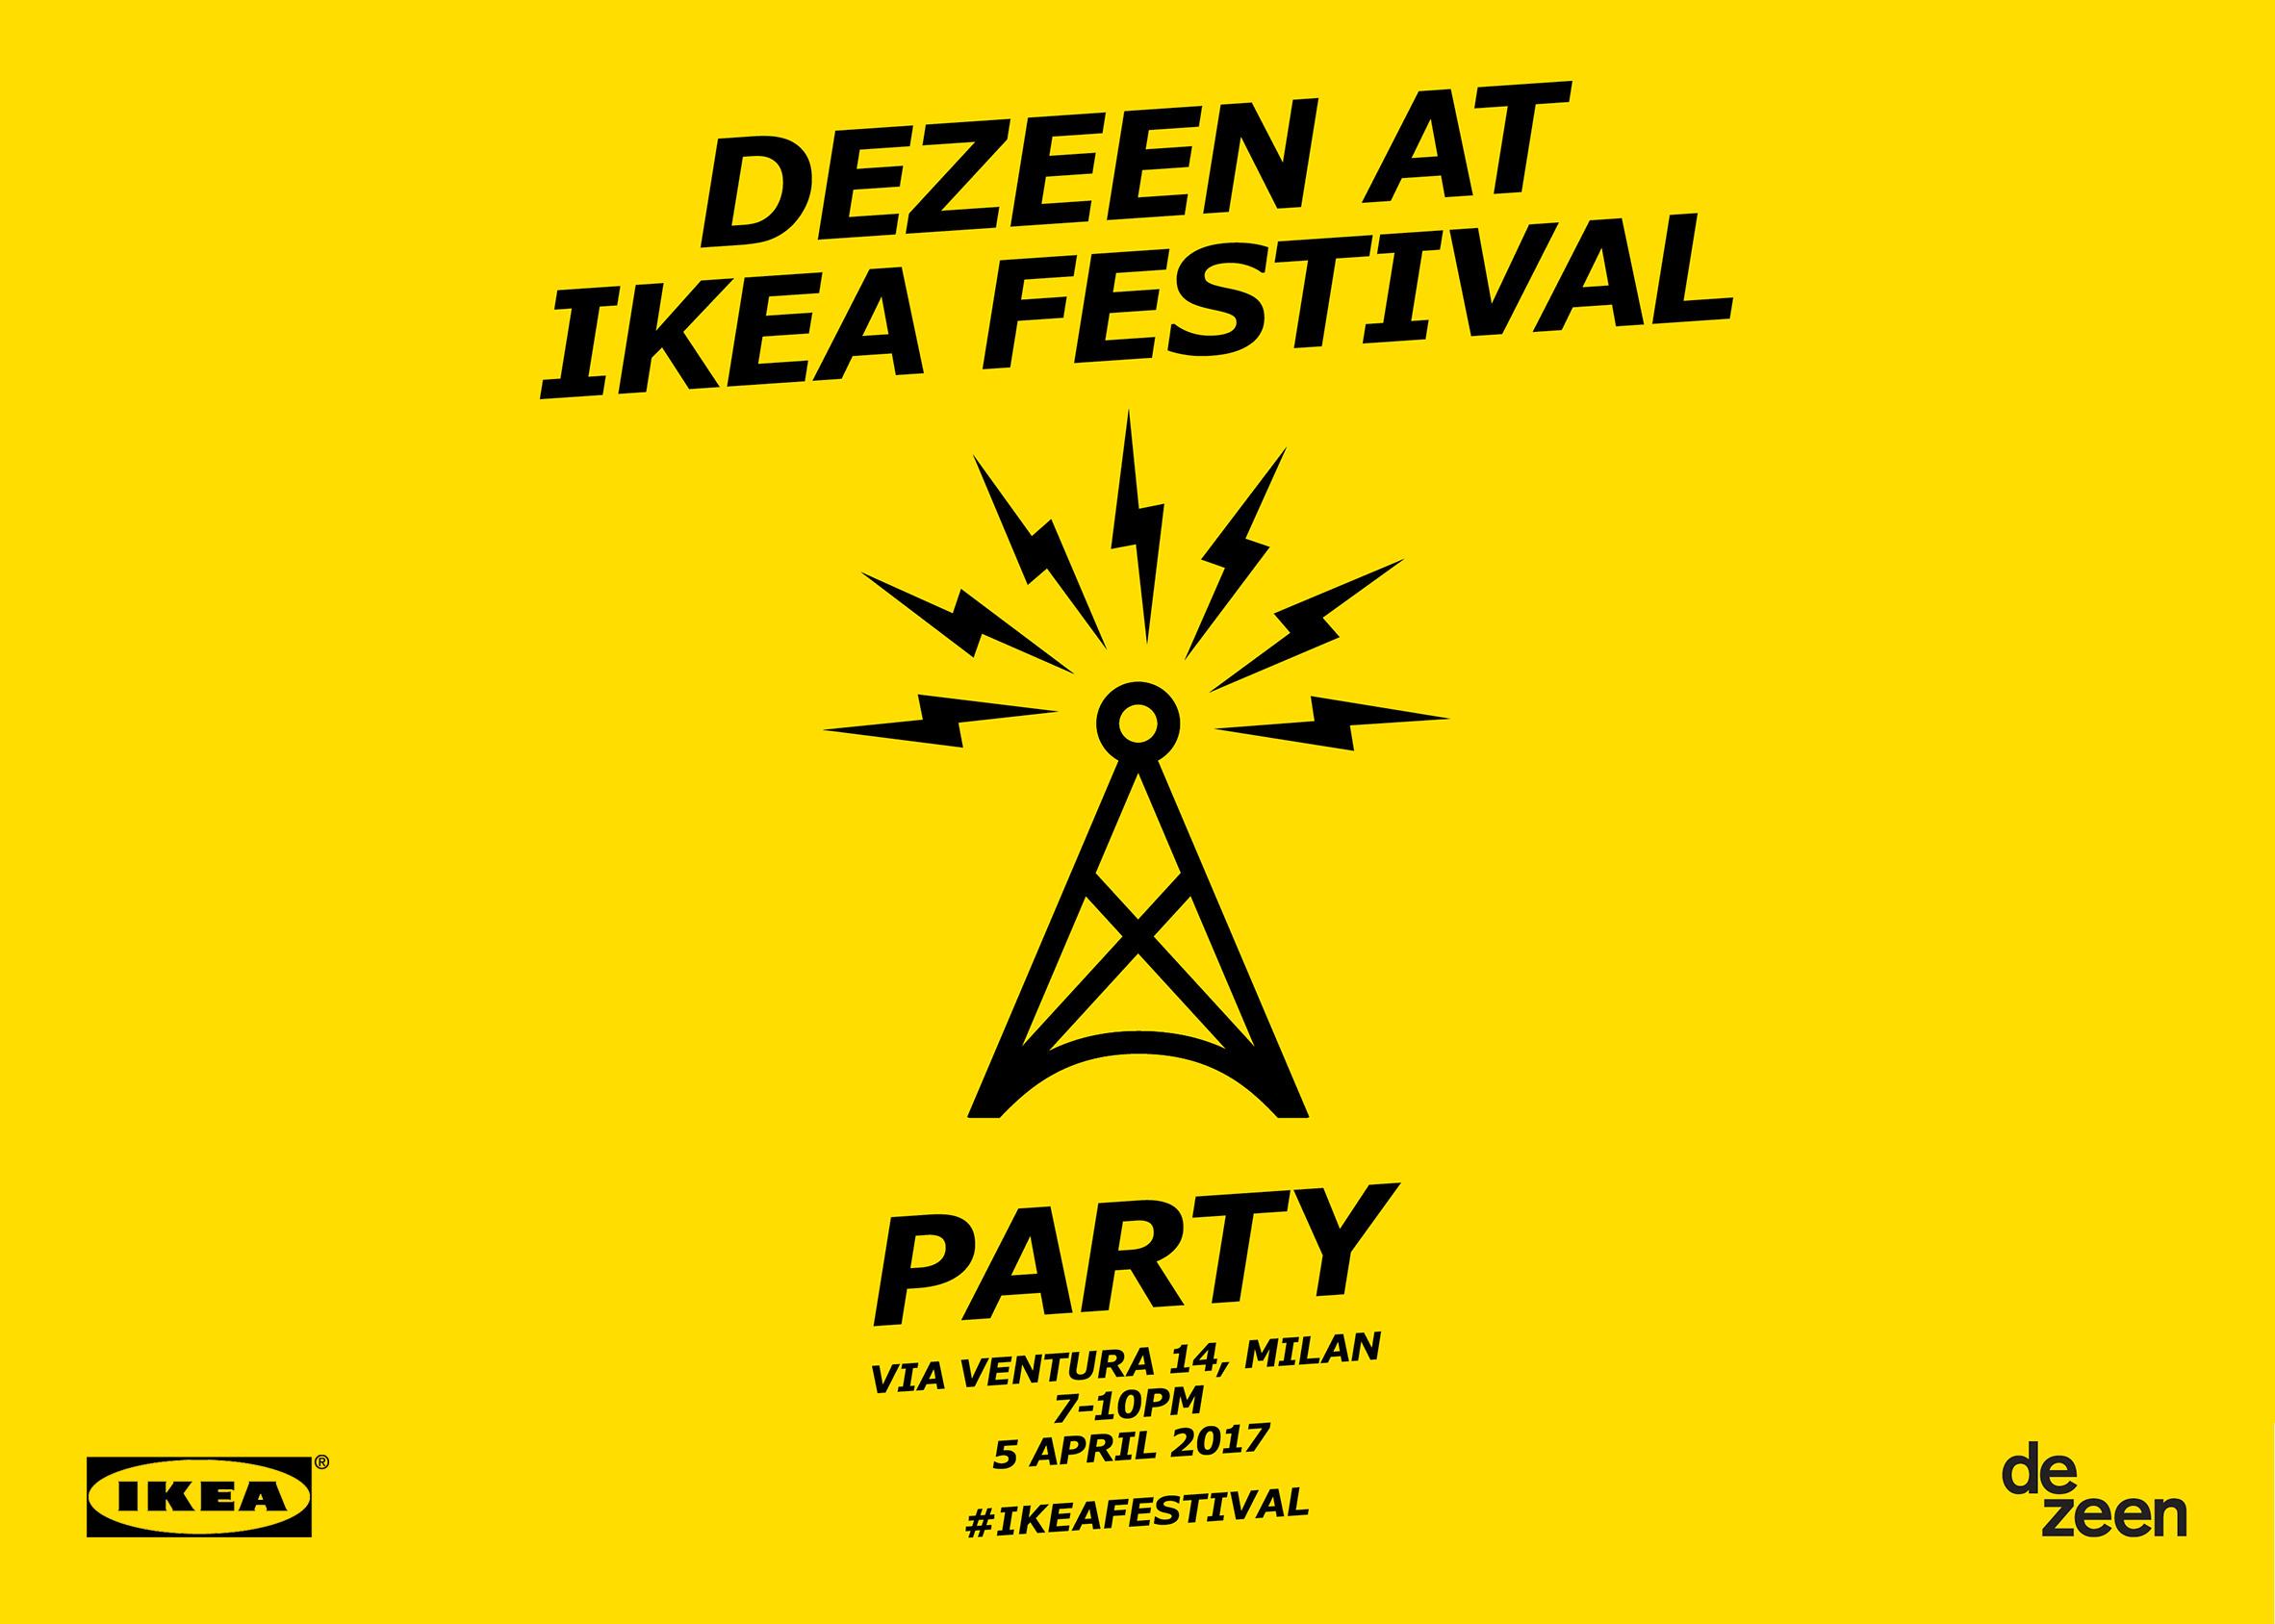 Dezeen at IKEA Festival Party